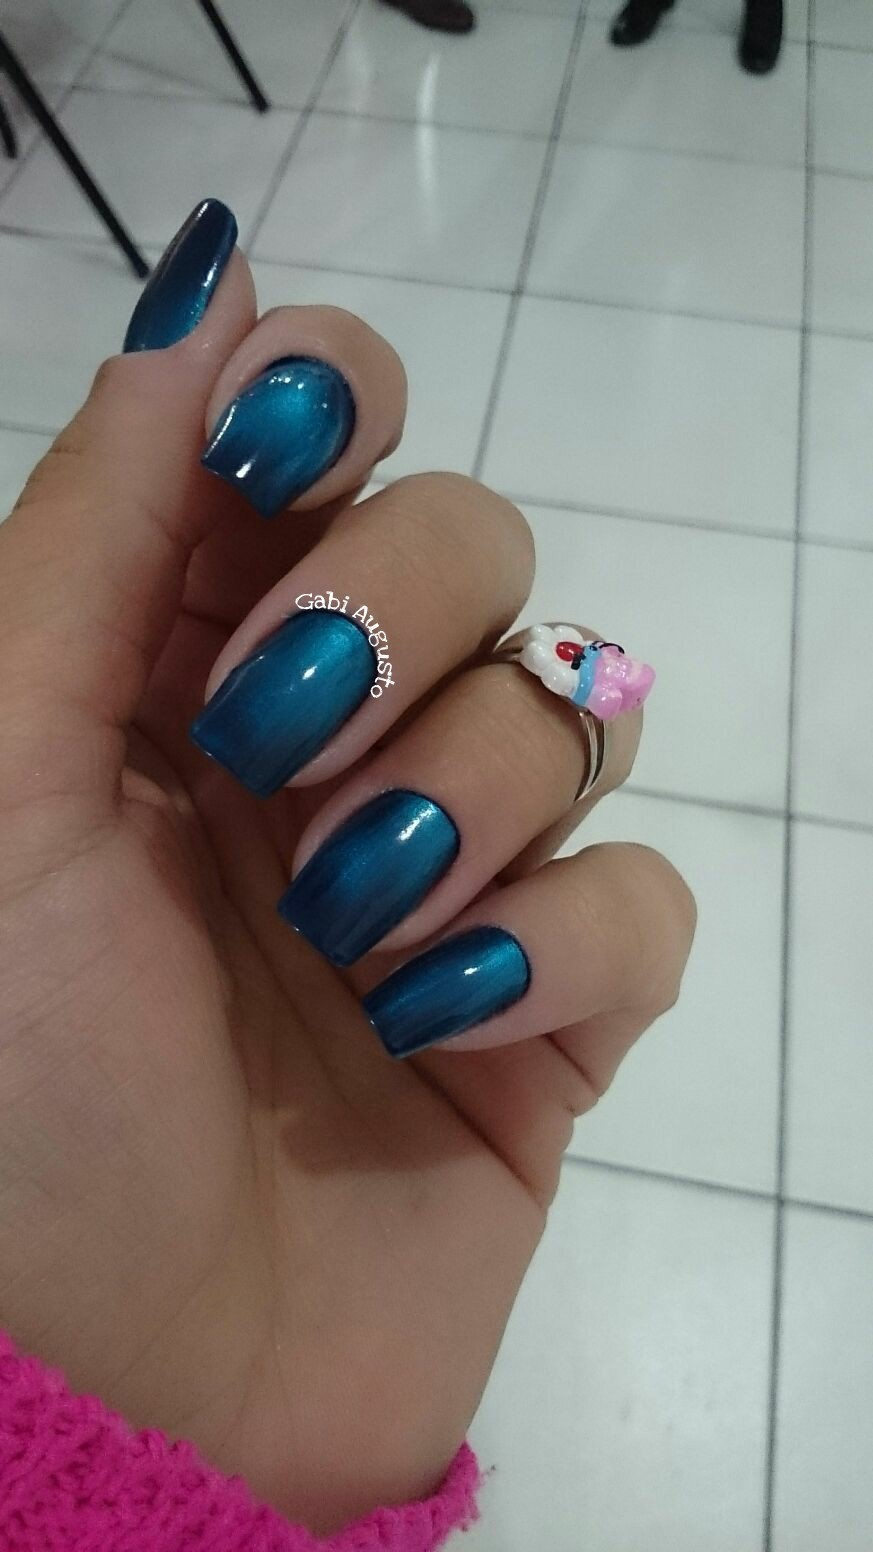 #maosepes #manicurenoabc #unhasbemfeitas #trabalhocomamor #saobernadodocampo #unhas #bygabiaugusto #manicuretop #ahazei #manicure #profissionaldabeleza  unha manicure e pedicure recepcionista